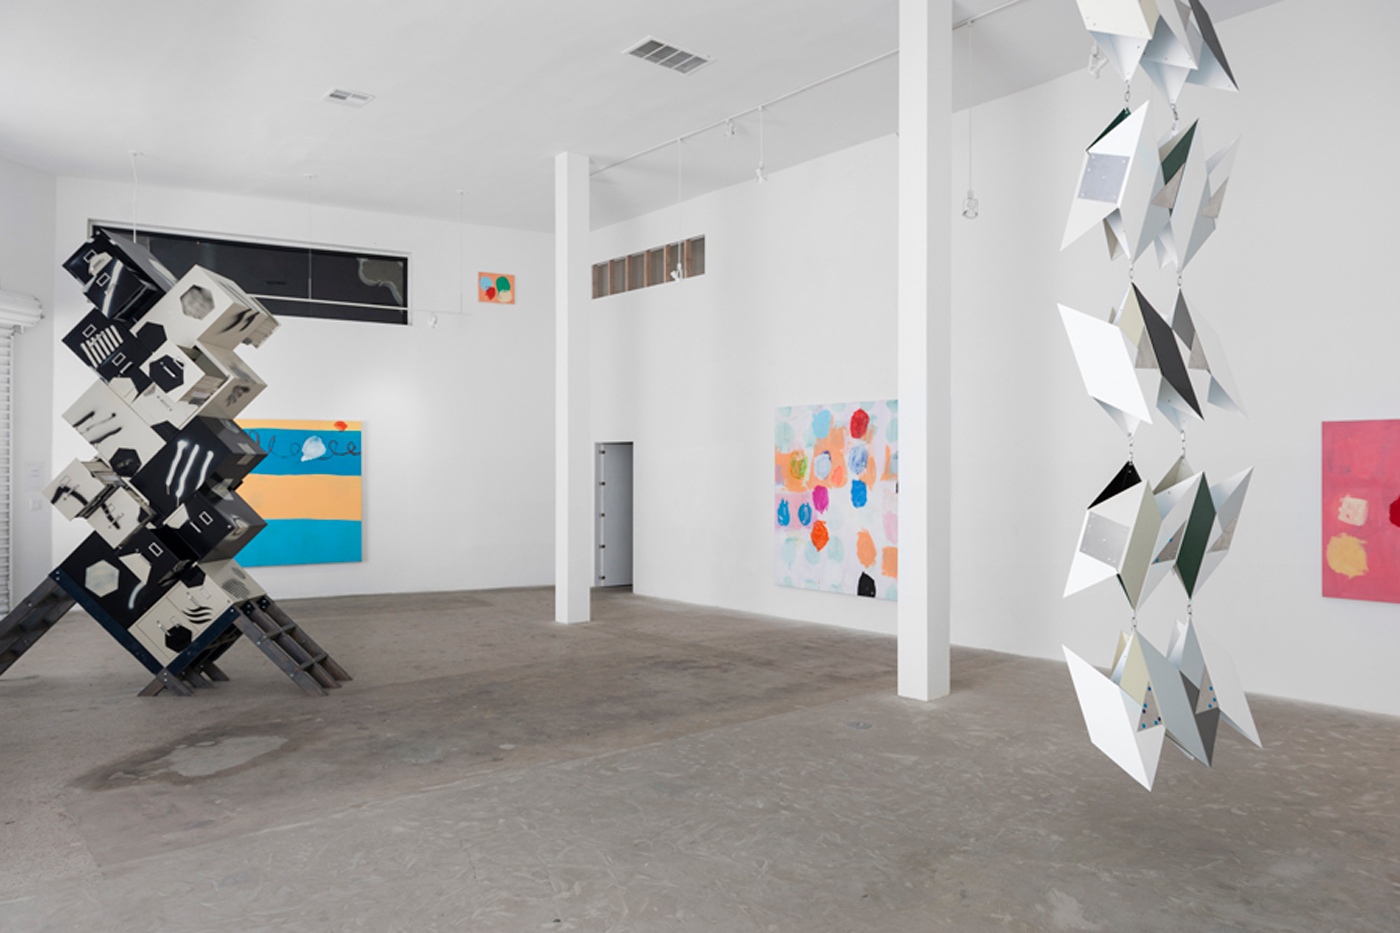 Jason Meadows + Jule Korneffel: Phase Patterns, art exhibit @ LTD Los Angeles // photo source: ltdlosangeles.com